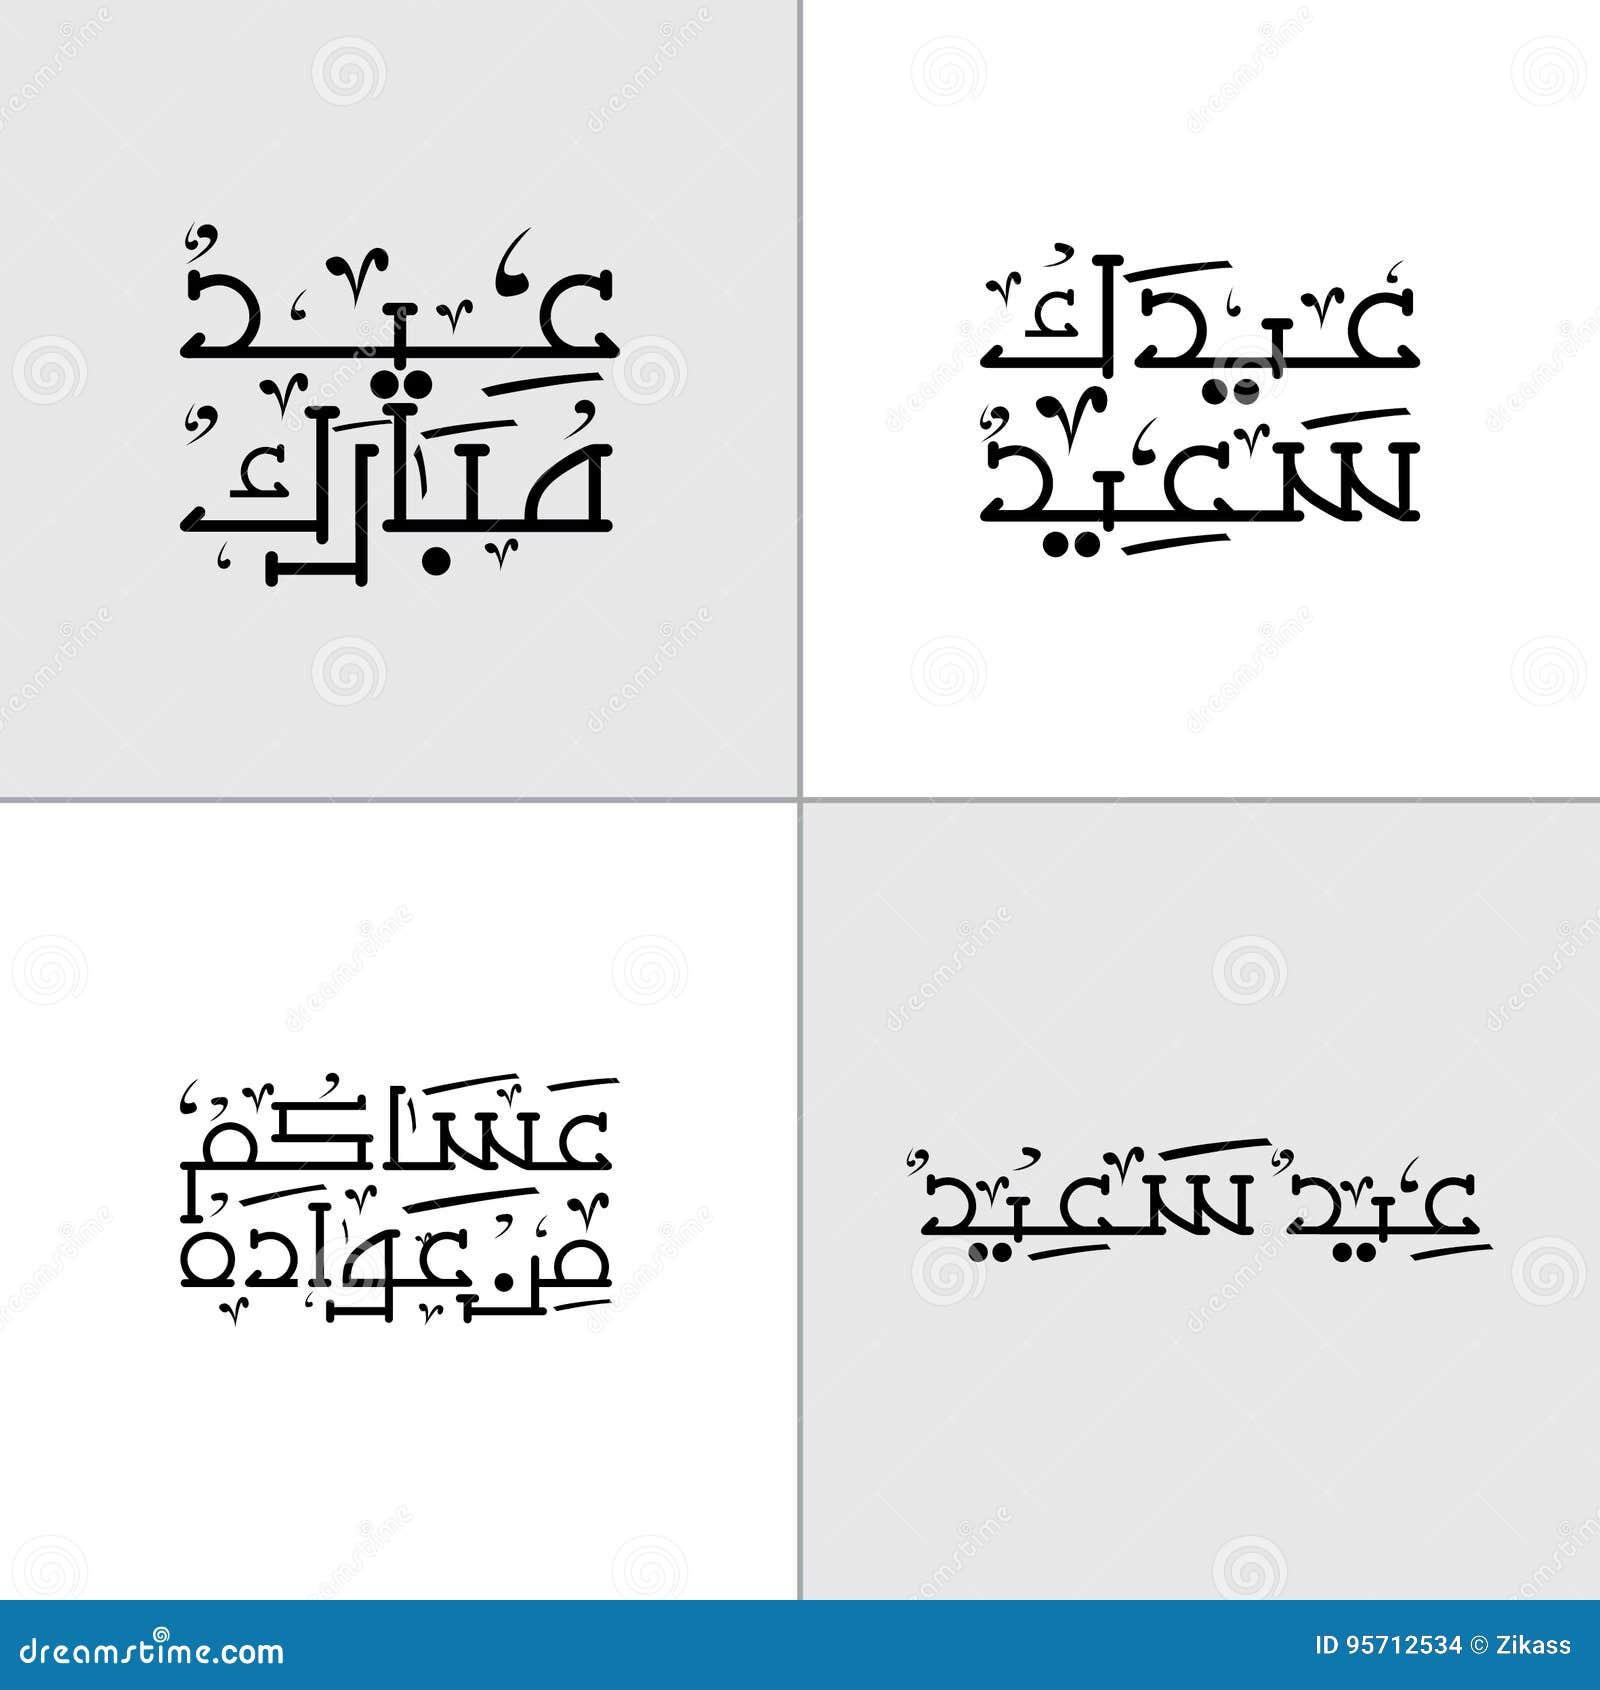 Eid mubarak greeting arabic typography stock photo image of download eid mubarak greeting arabic typography stock photo image of festival mubarak 95712534 m4hsunfo